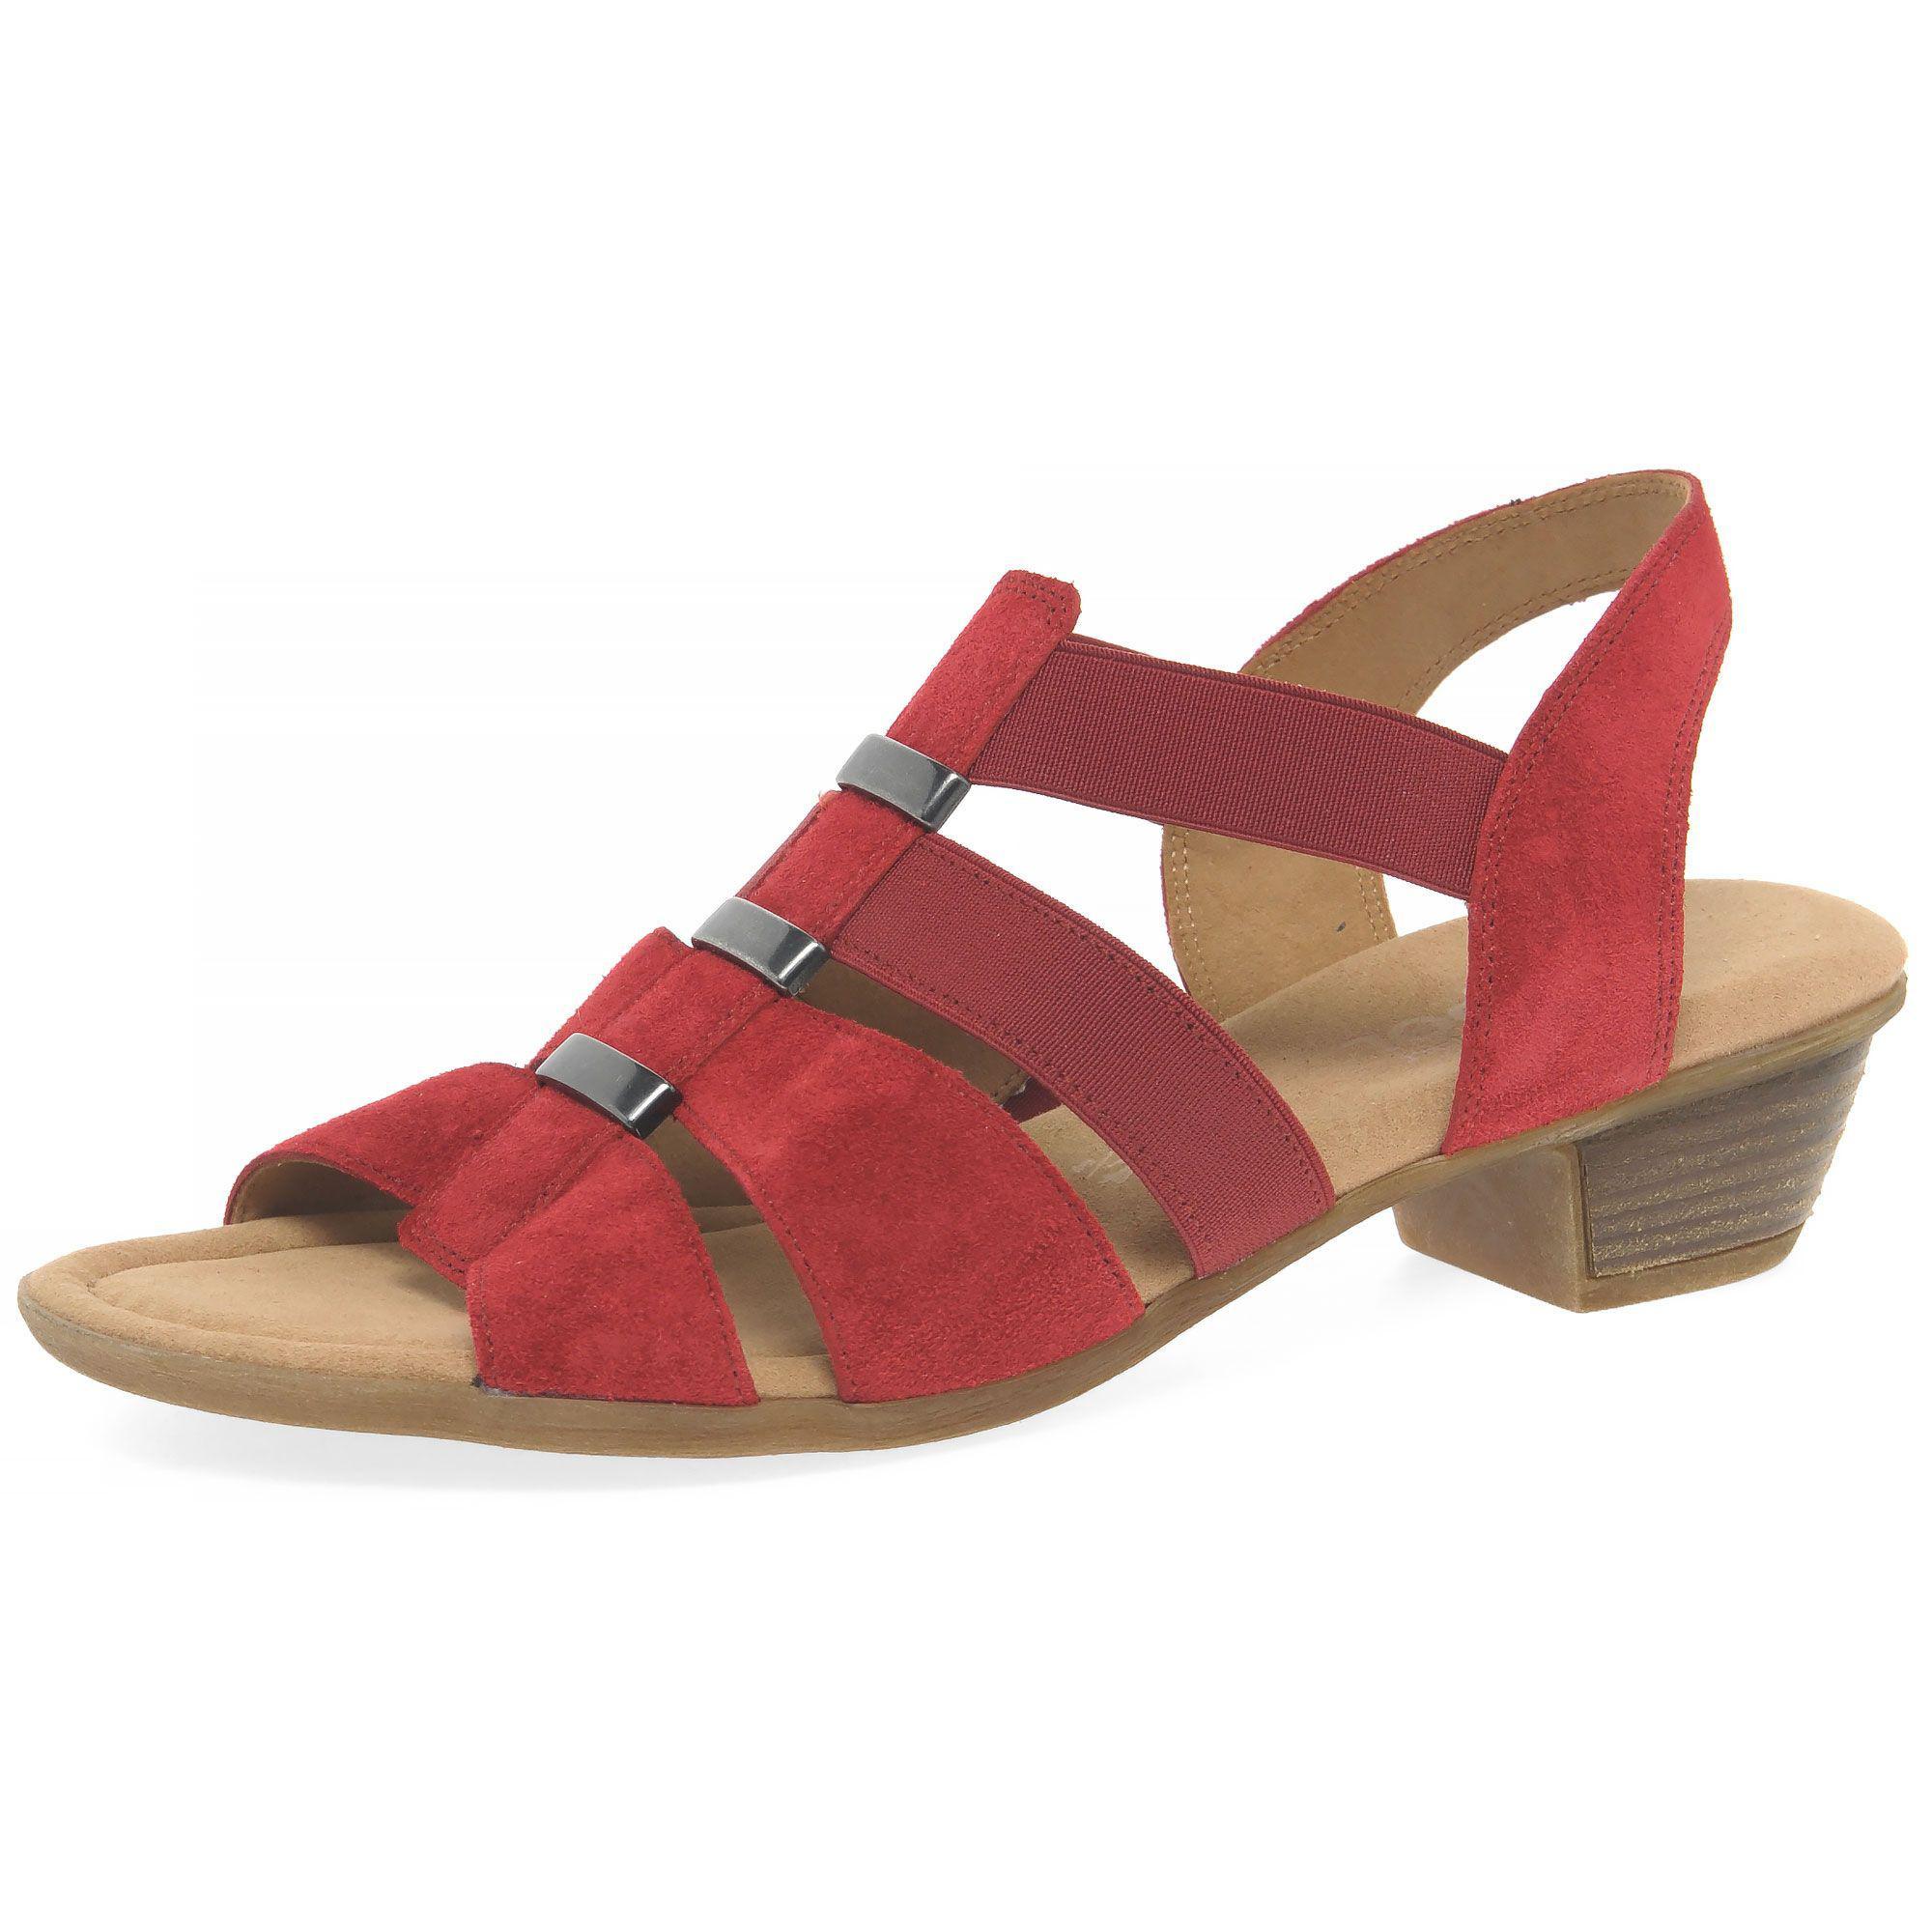 Gabor Joan Wide Fit Block Heeled Sandals Pictures v3wZbM